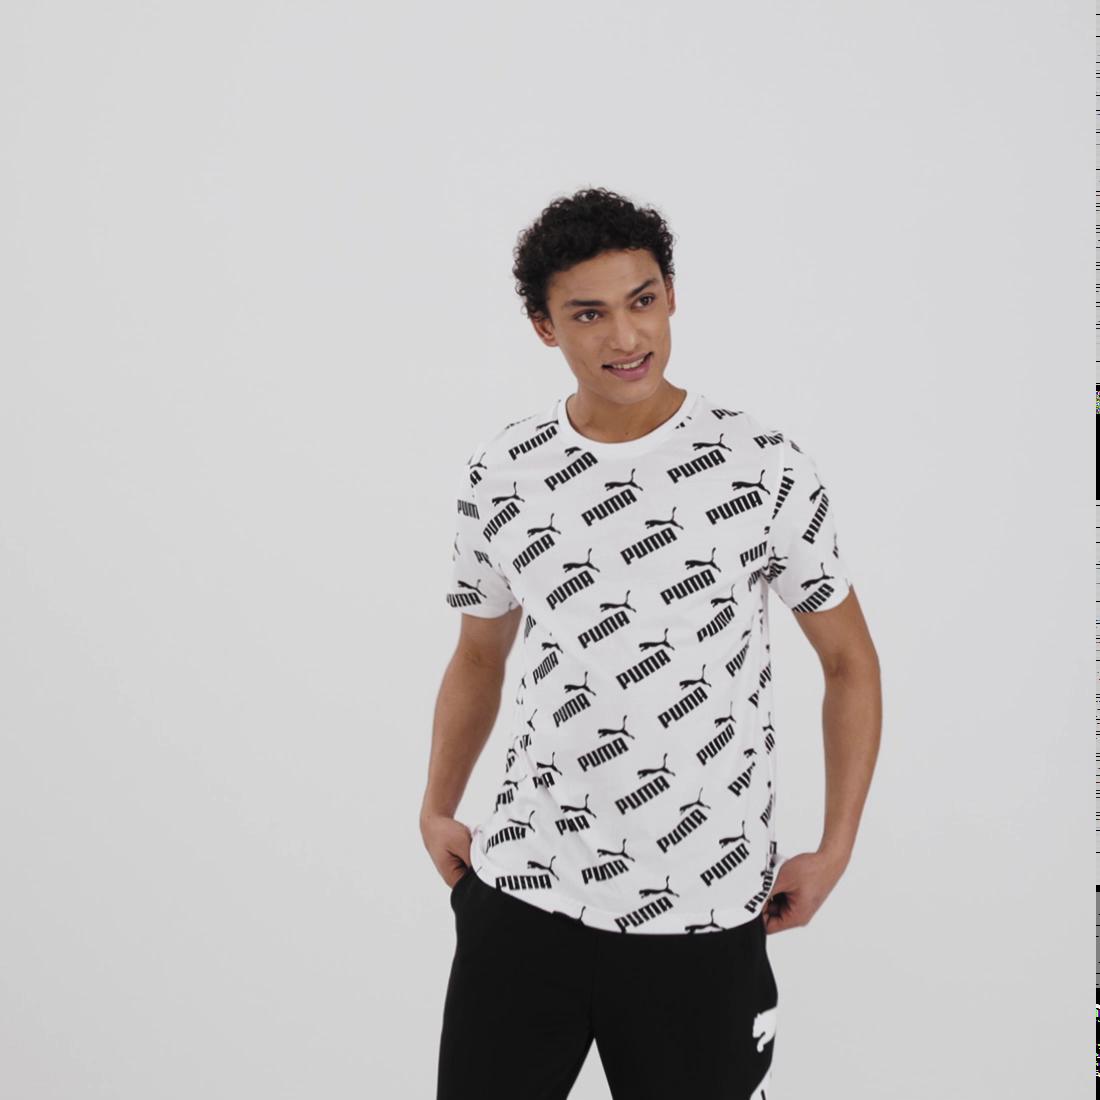 Image PUMA Camiseta AMPLIFIED AOP Masculina #6